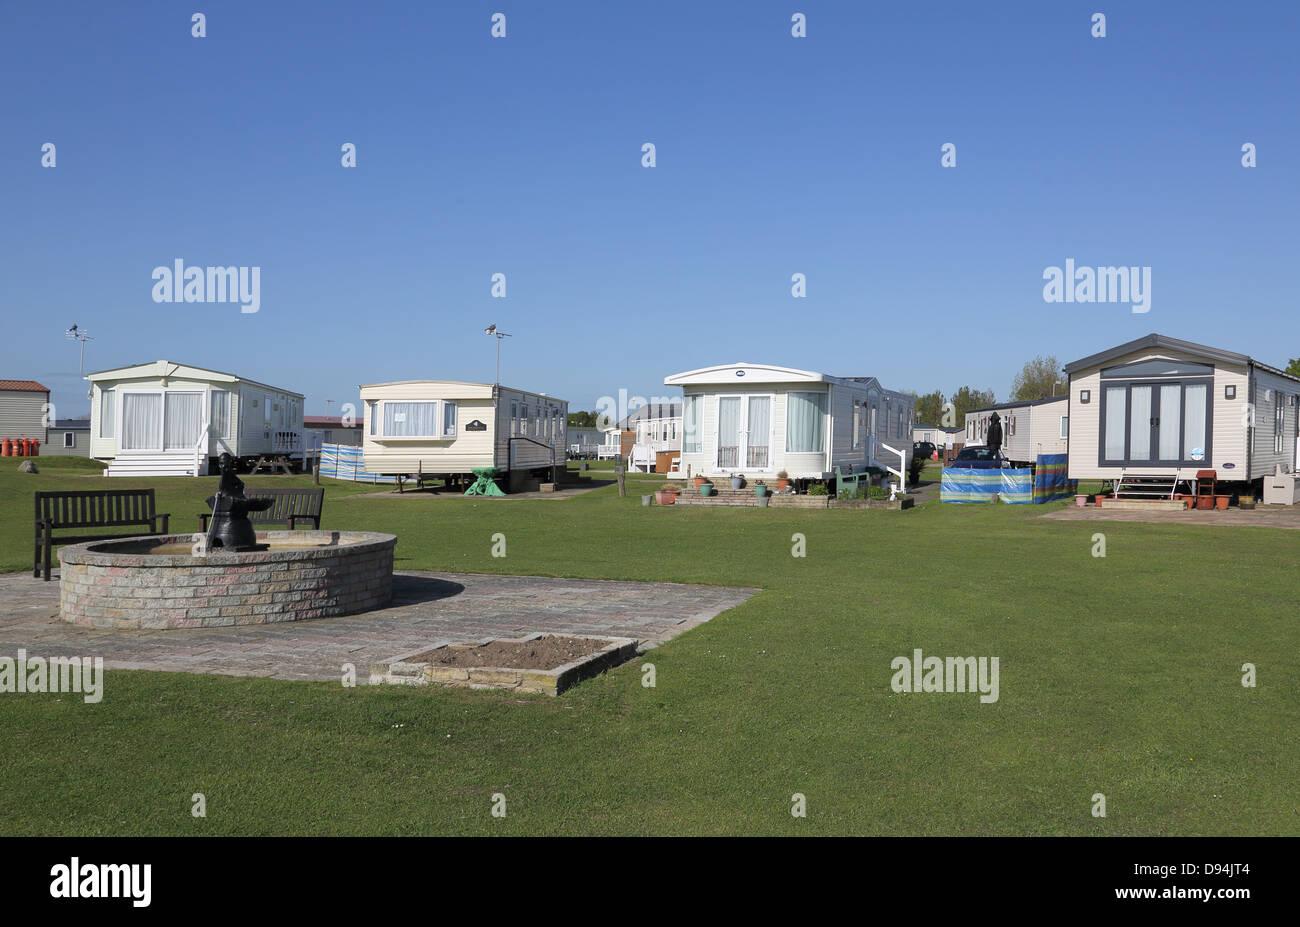 caravans at hopton on sea holiday park on the suffolk coast - Stock Image